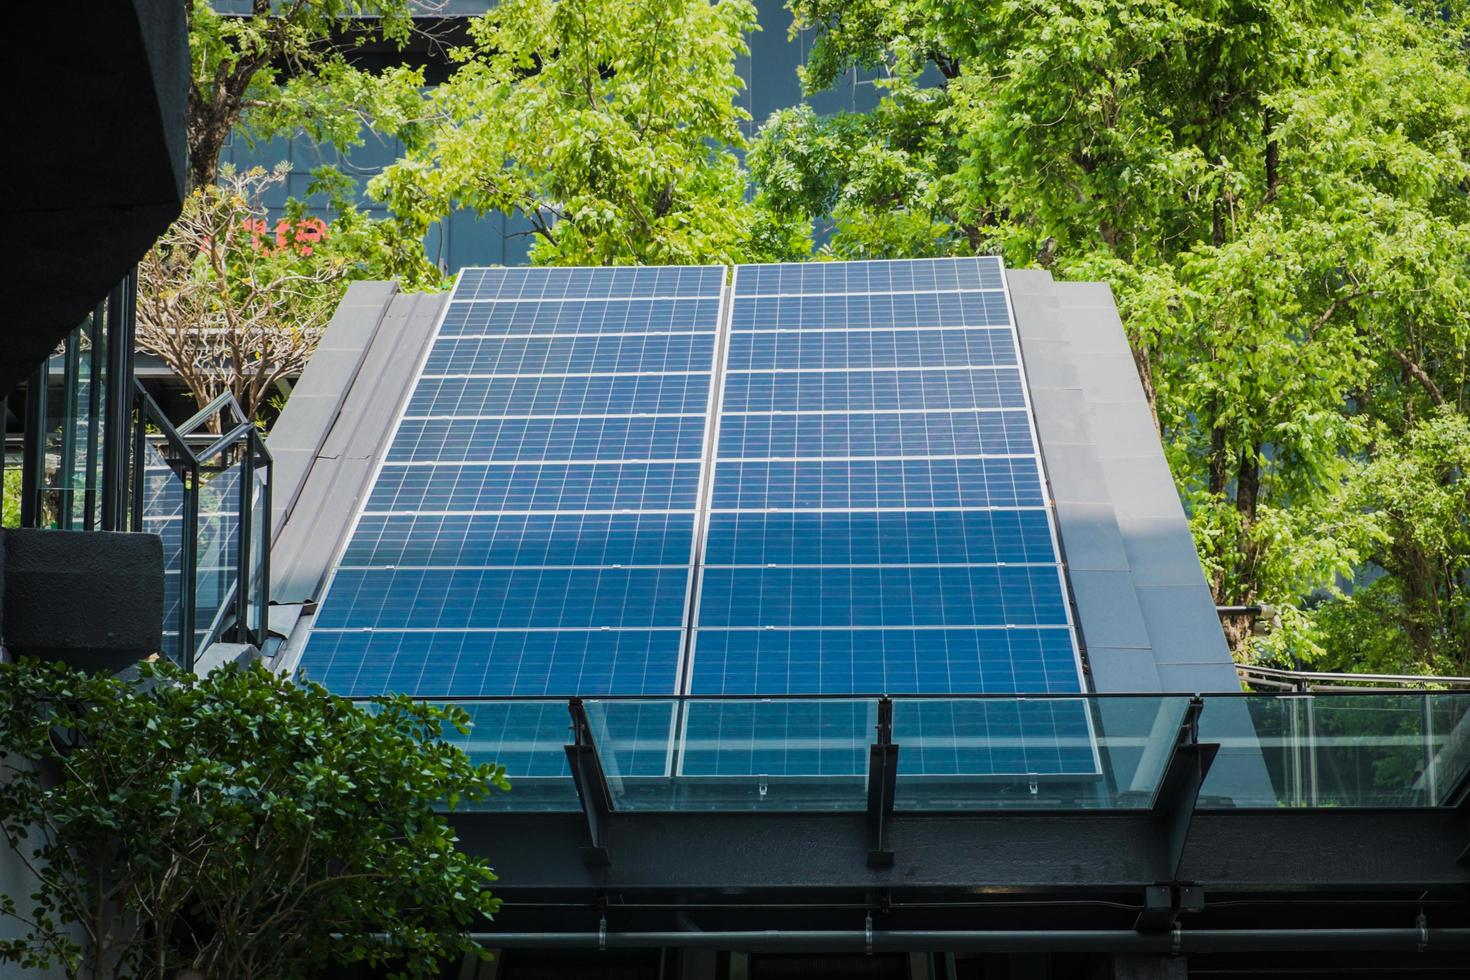 solenergipaneler installerade på modernt tak foto